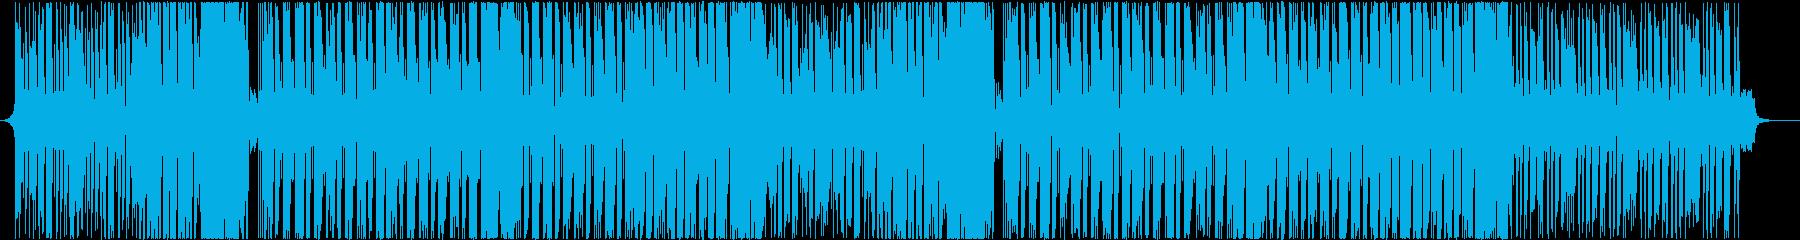 Kawaii系Future Bass 3の再生済みの波形